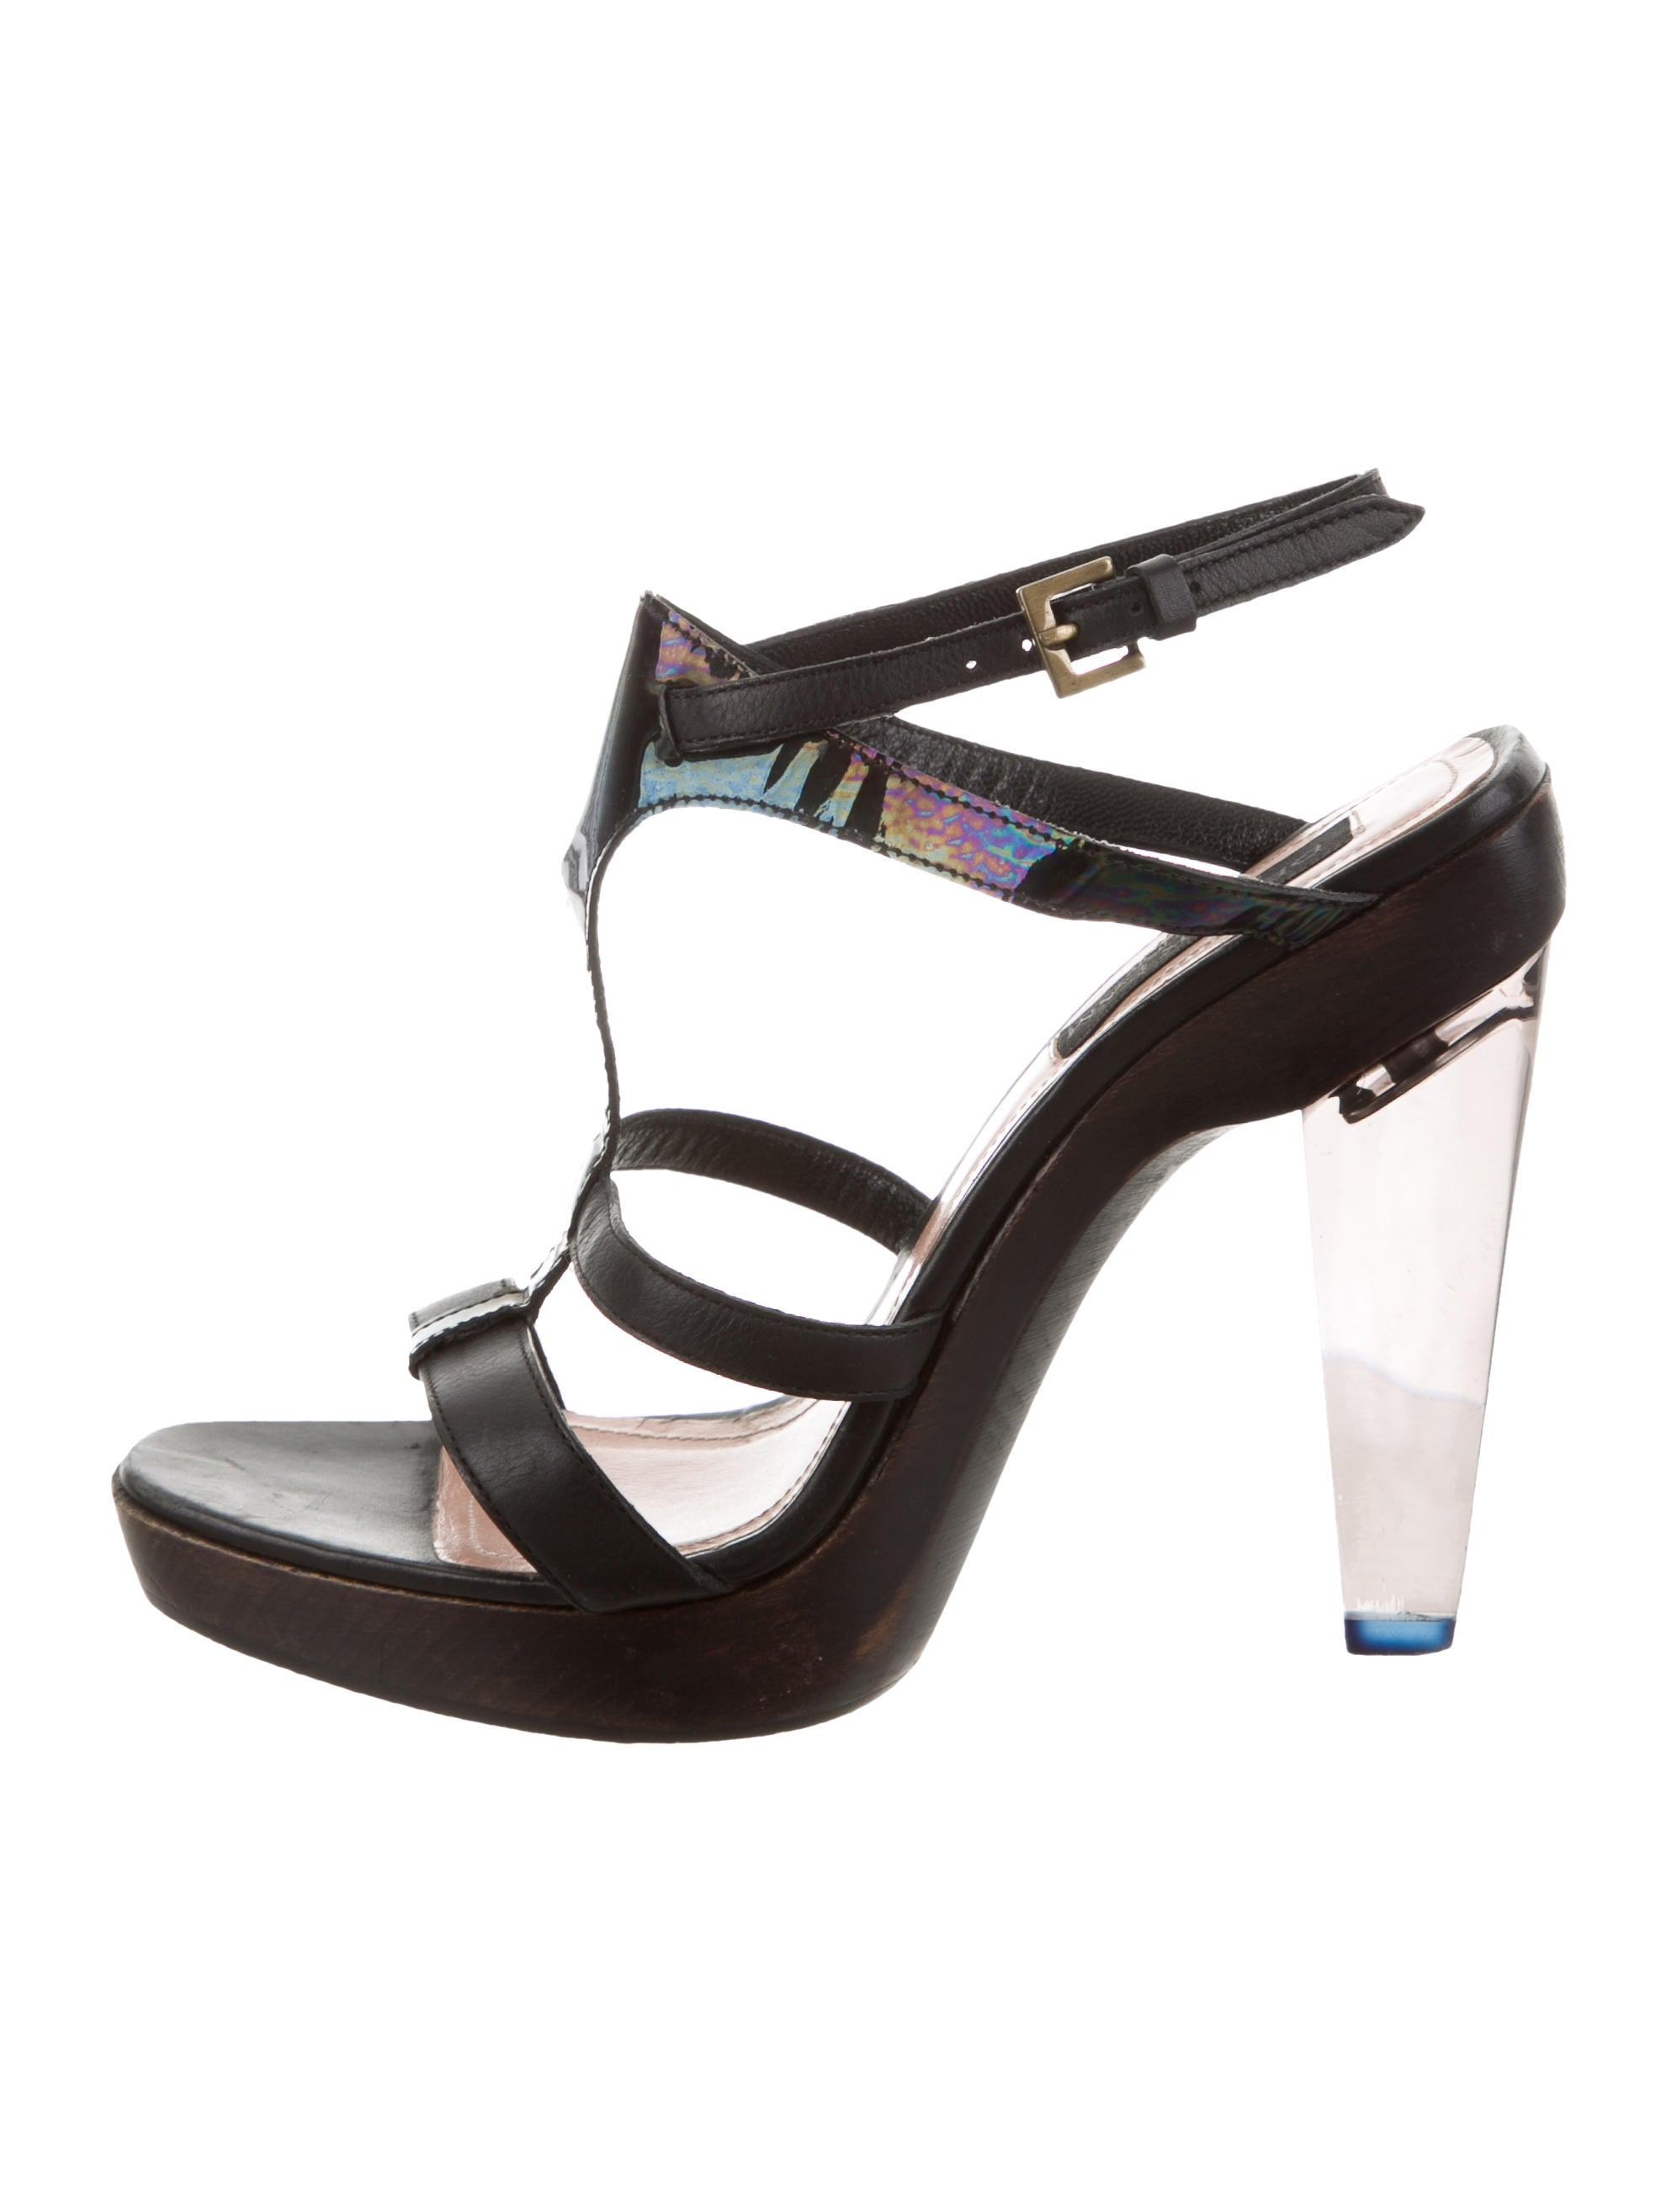 buy cheap amazing price buy cheap visa payment Derek Lam Multistrap Leather Sandals clearance deals affordable cheap online eMUzmWs2